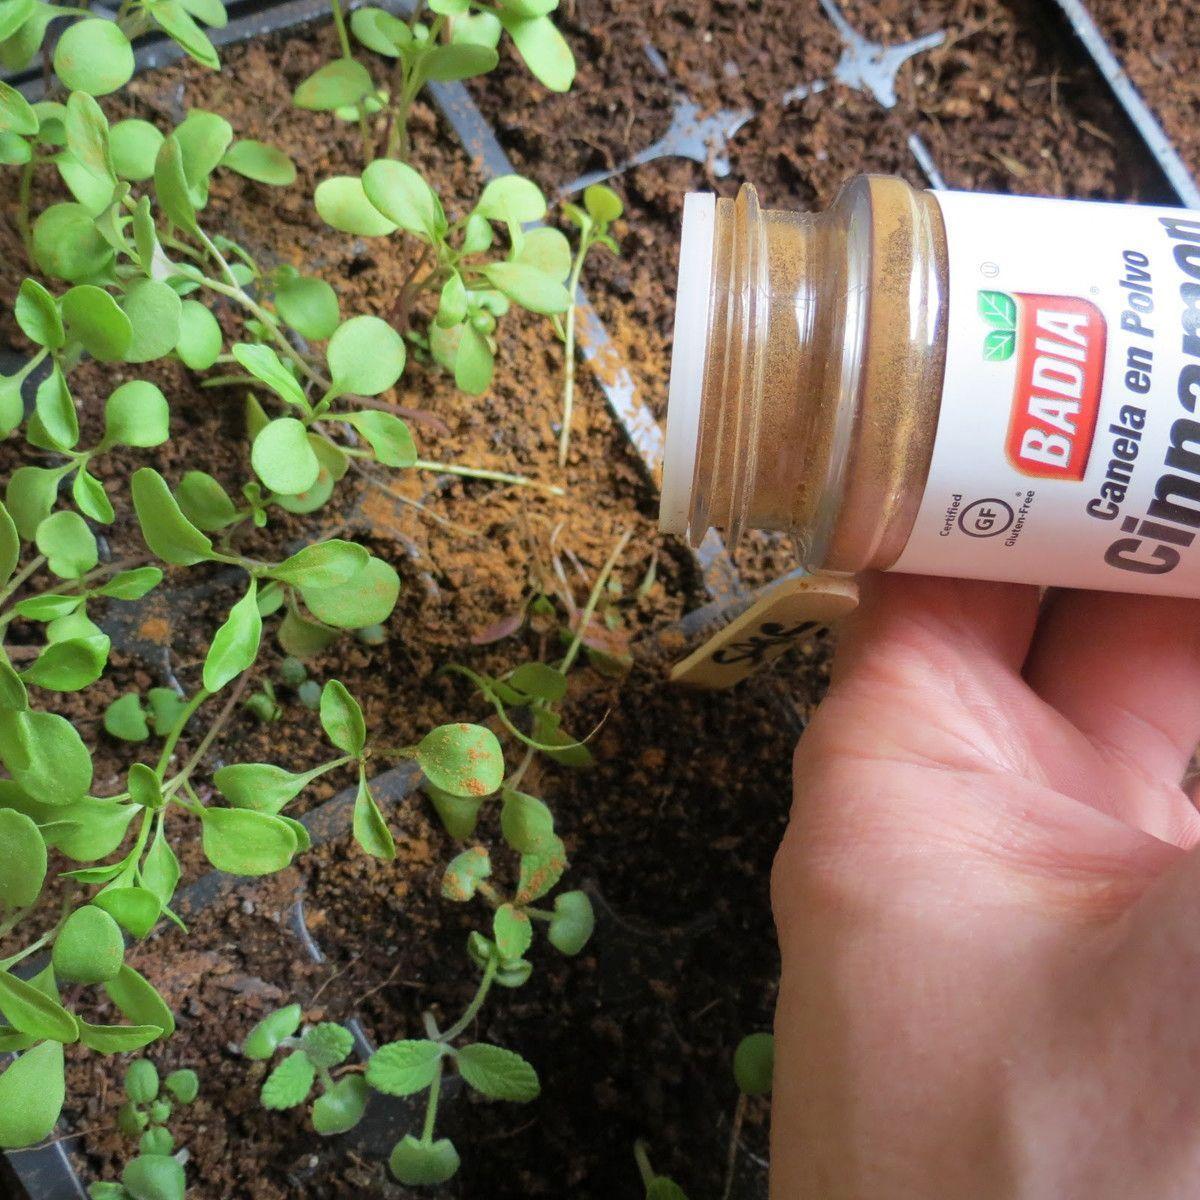 Sprinkle cinnamon around seedlings to prevent fungus from growing ...